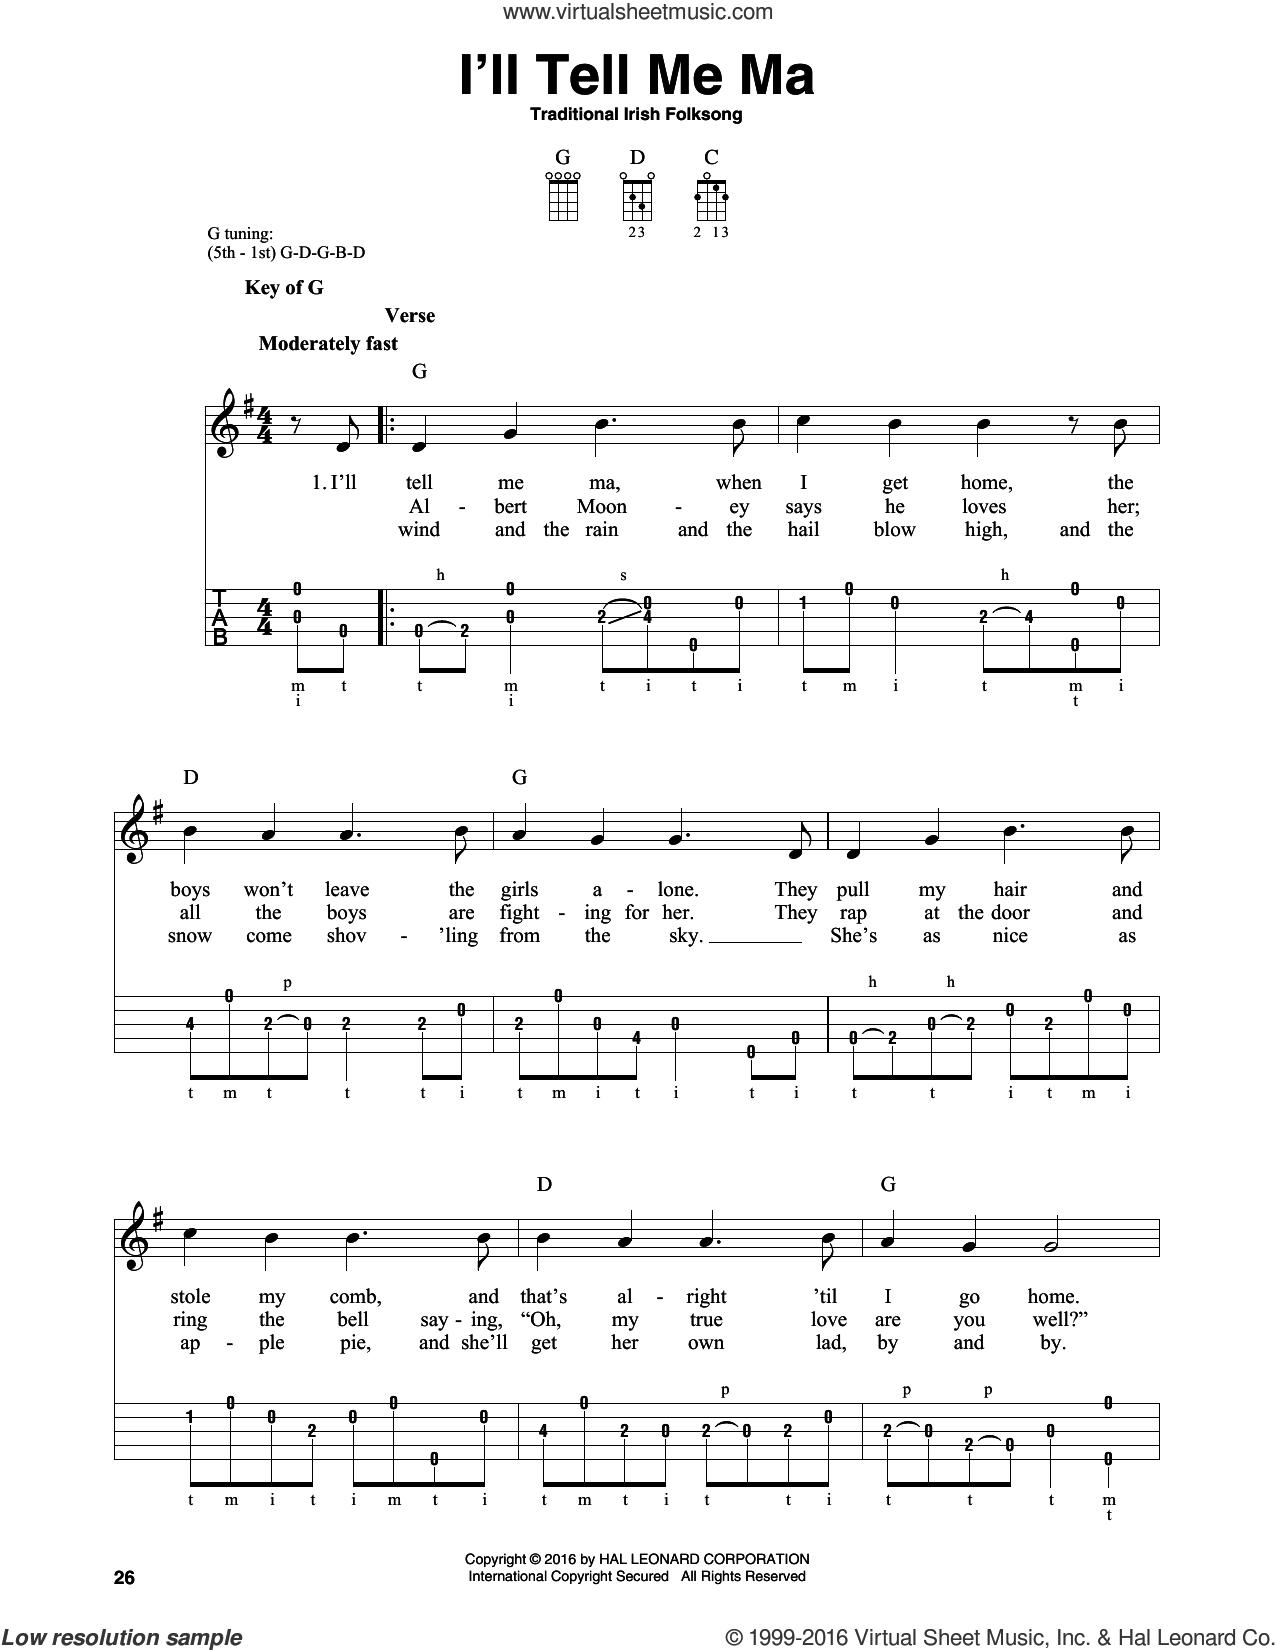 I'll Tell Me Ma sheet music for banjo solo, intermediate skill level